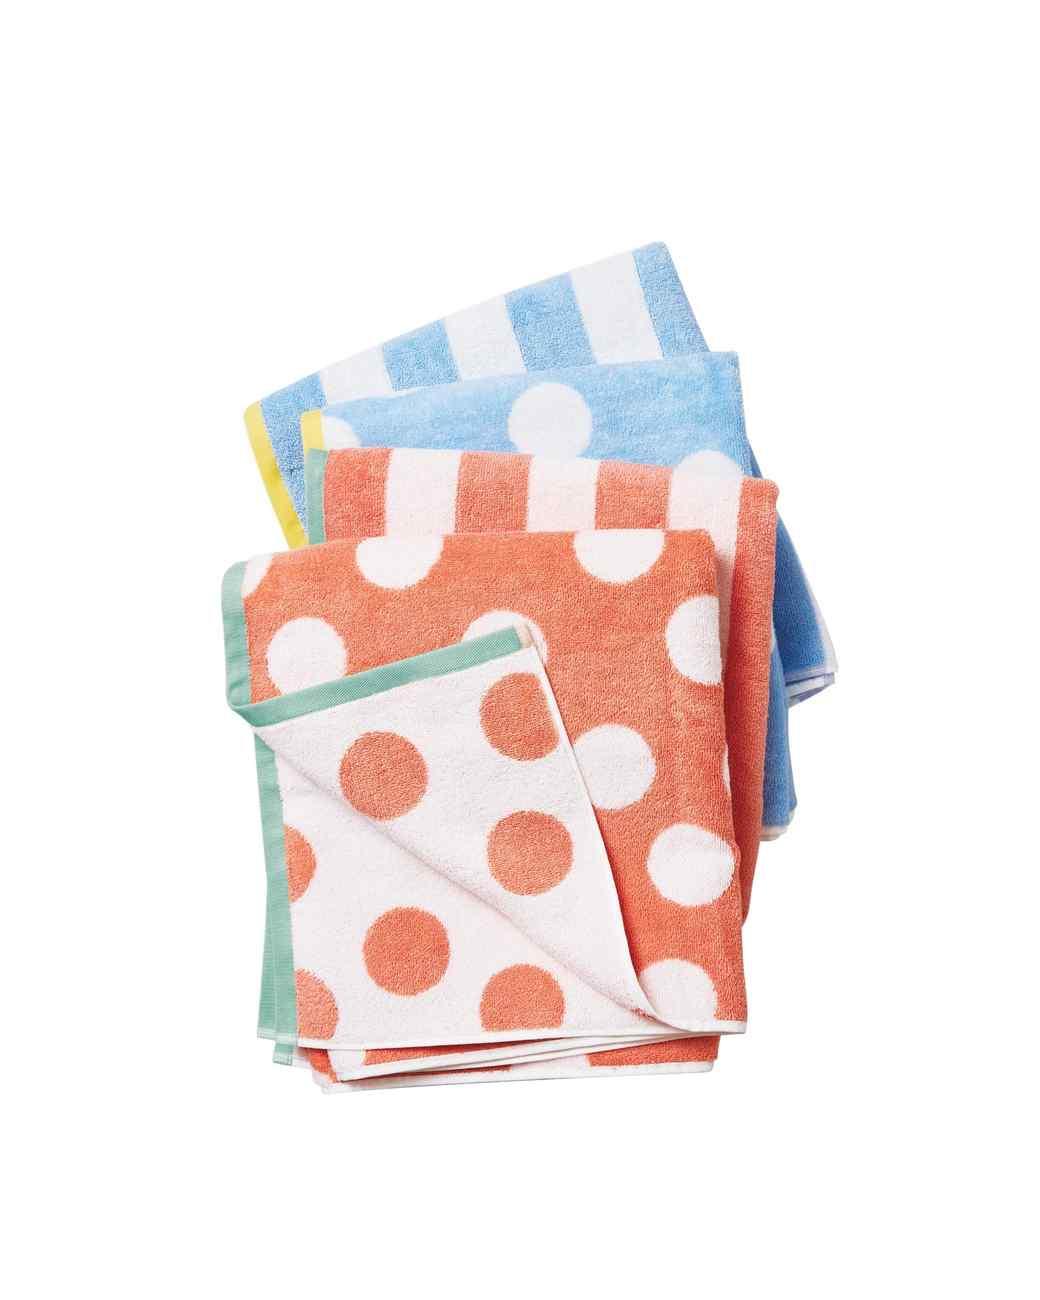 macys-towels-018-d112767-0216.jpg